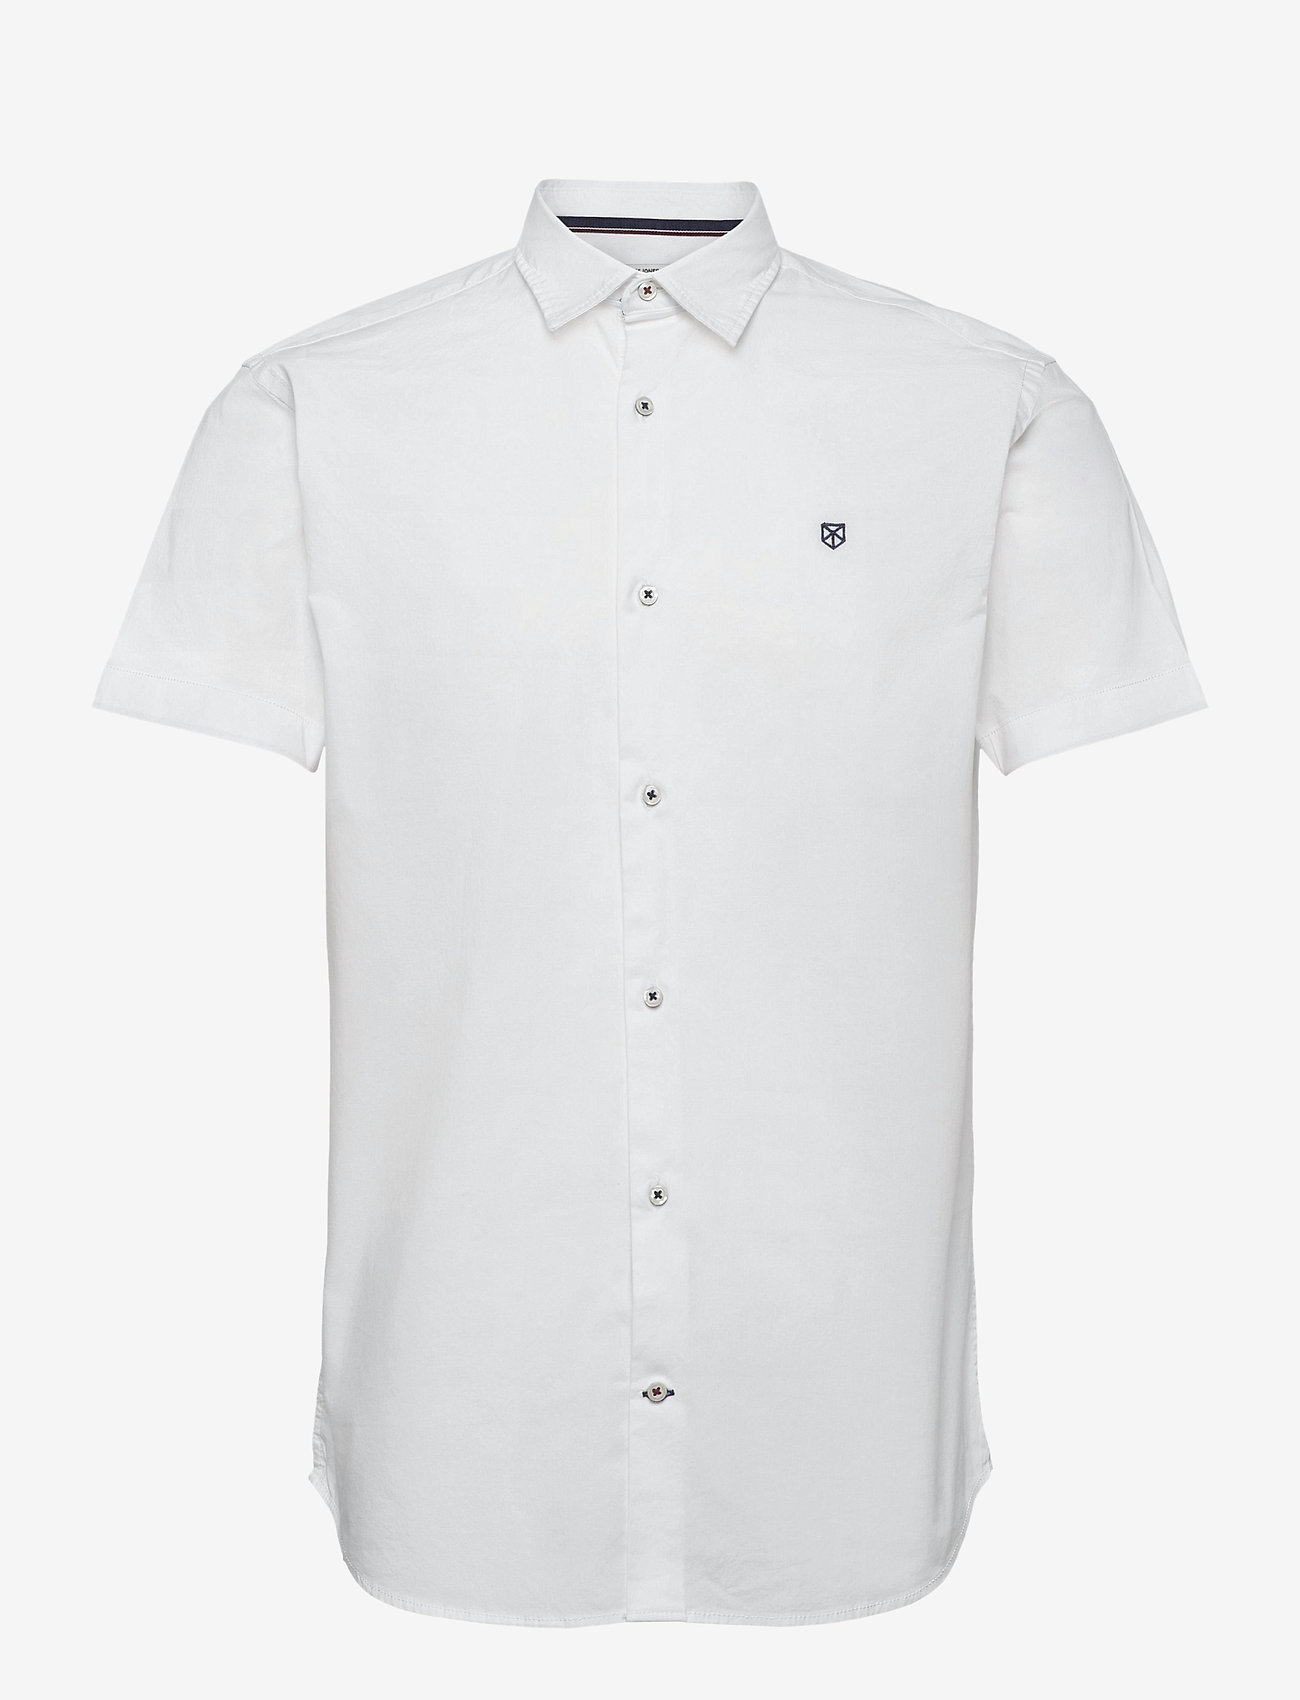 Jack & Jones - JPRBLAWORLD LOGO SHIRT S/S STRETCH EXP - kortärmade skjortor - white - 0